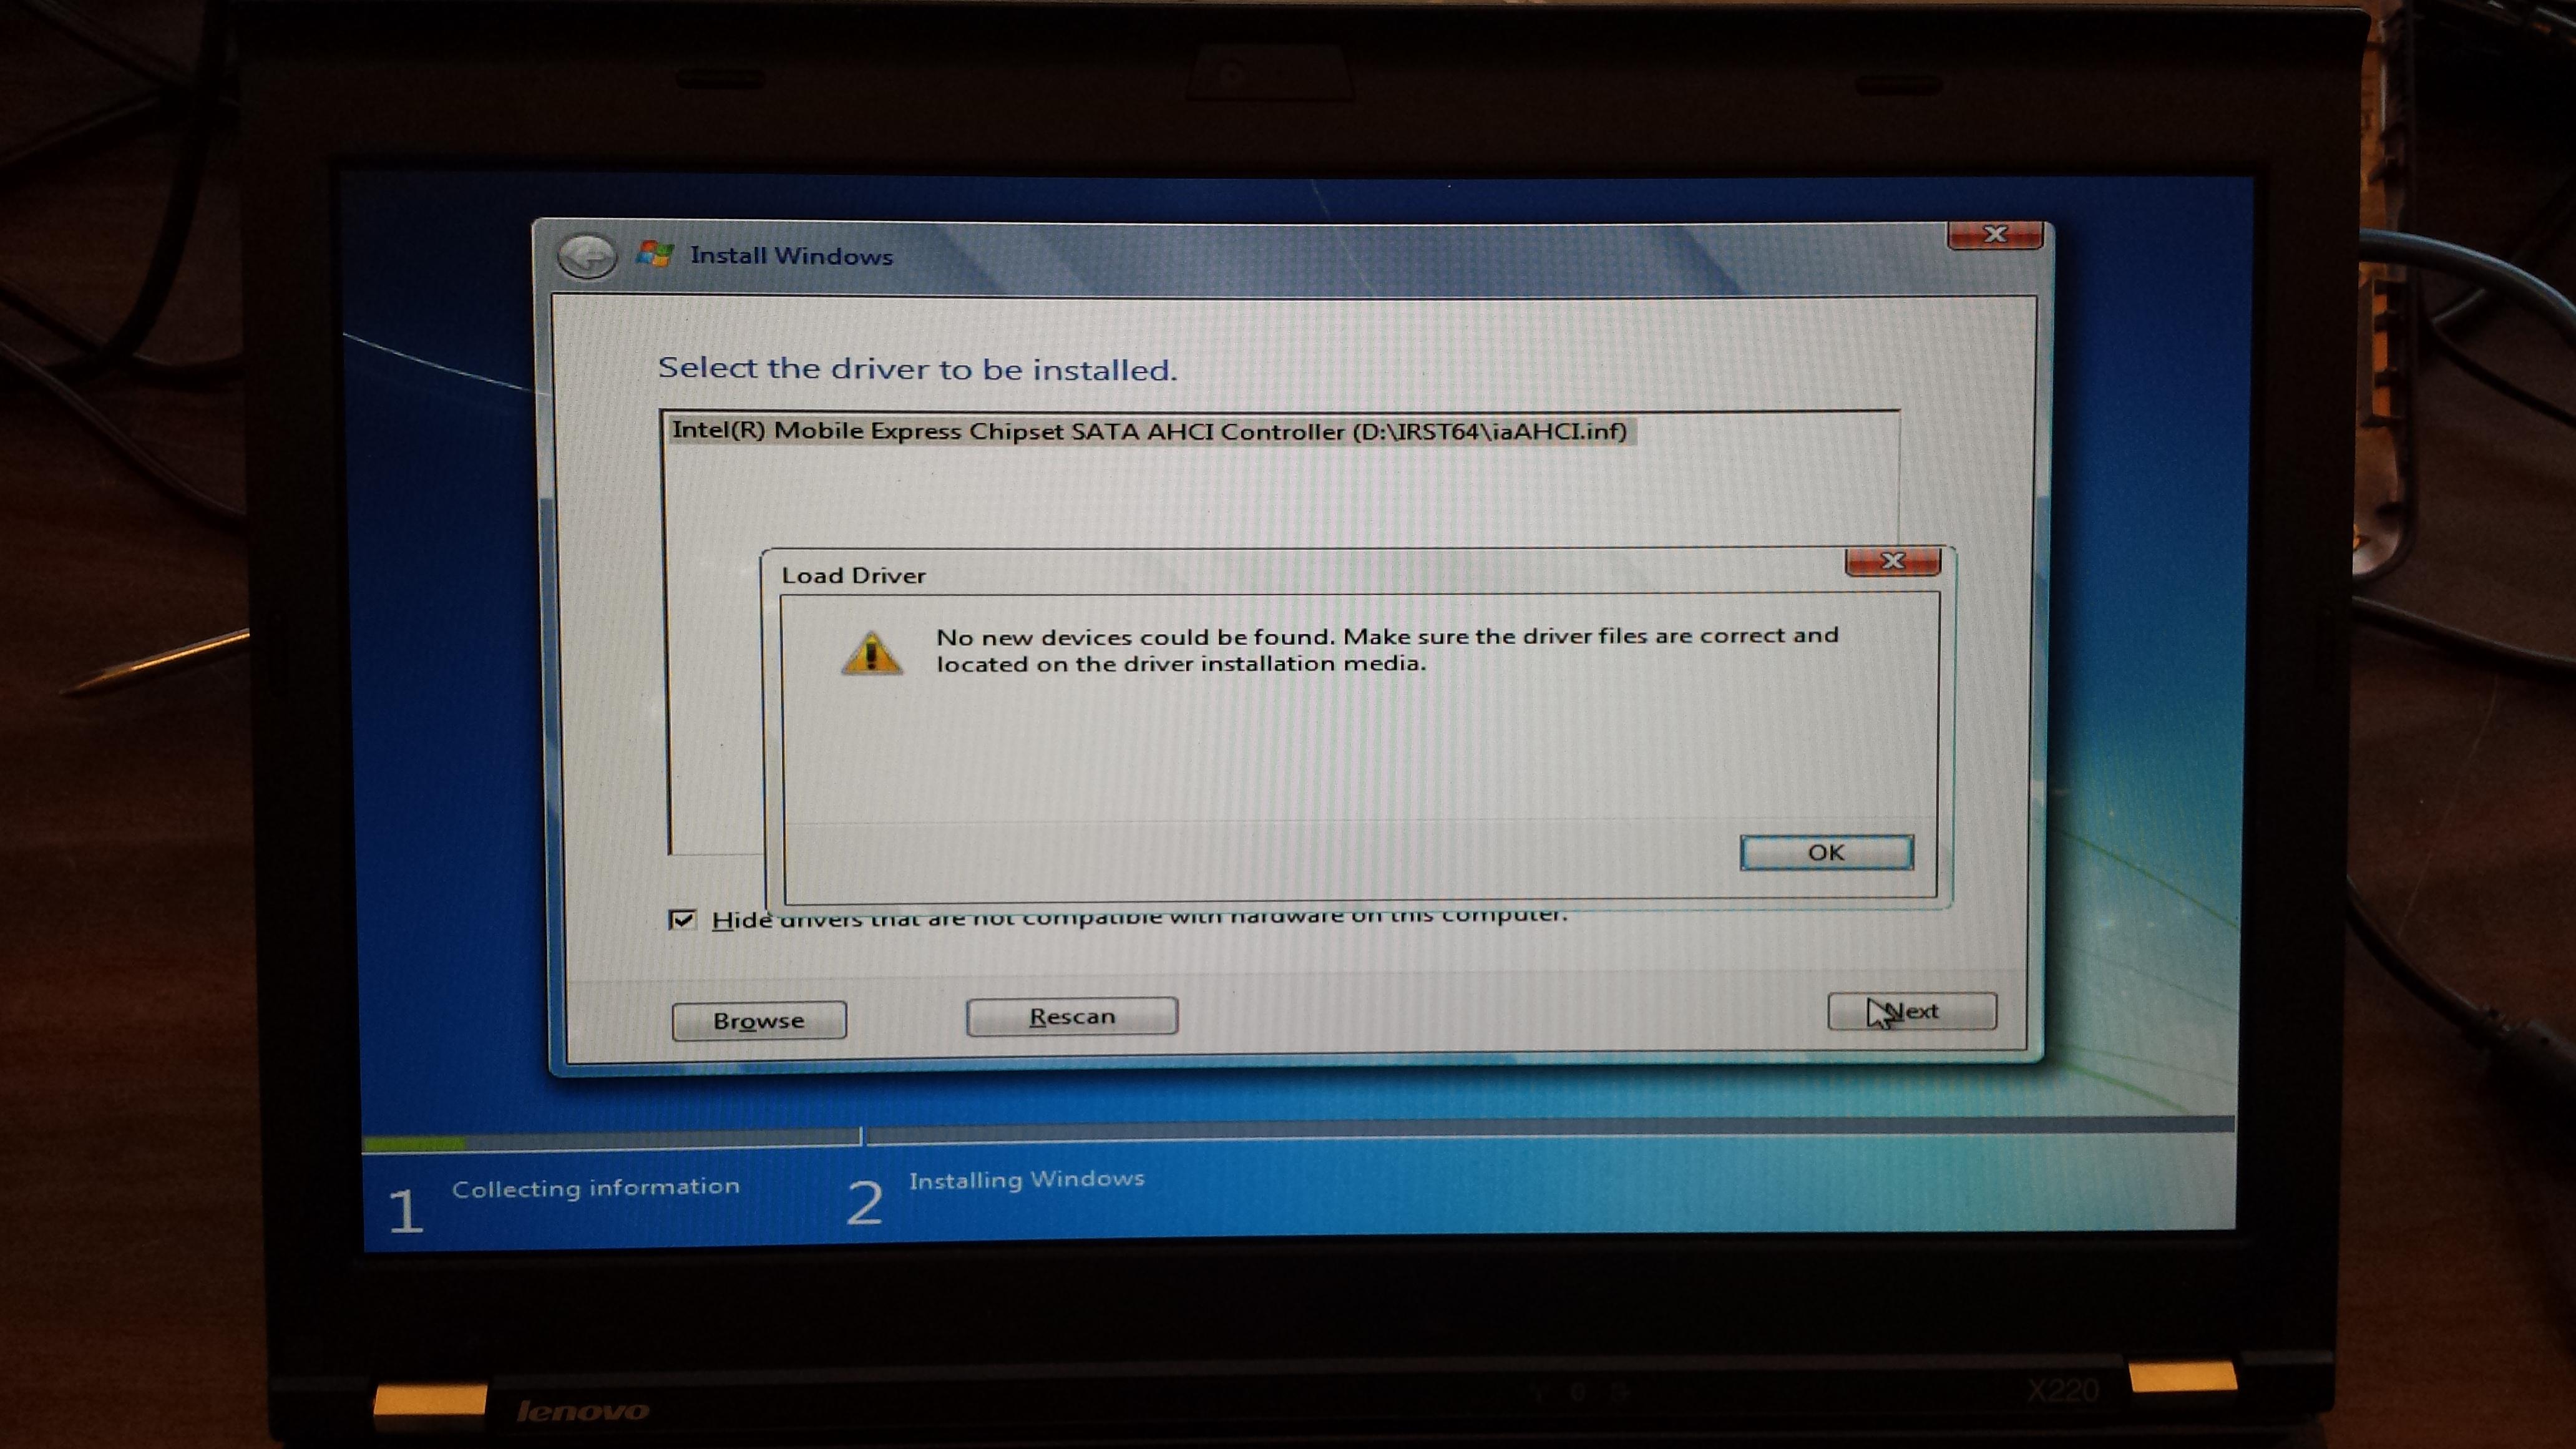 Installing Windows 7 on Lenovo X220 Laptop